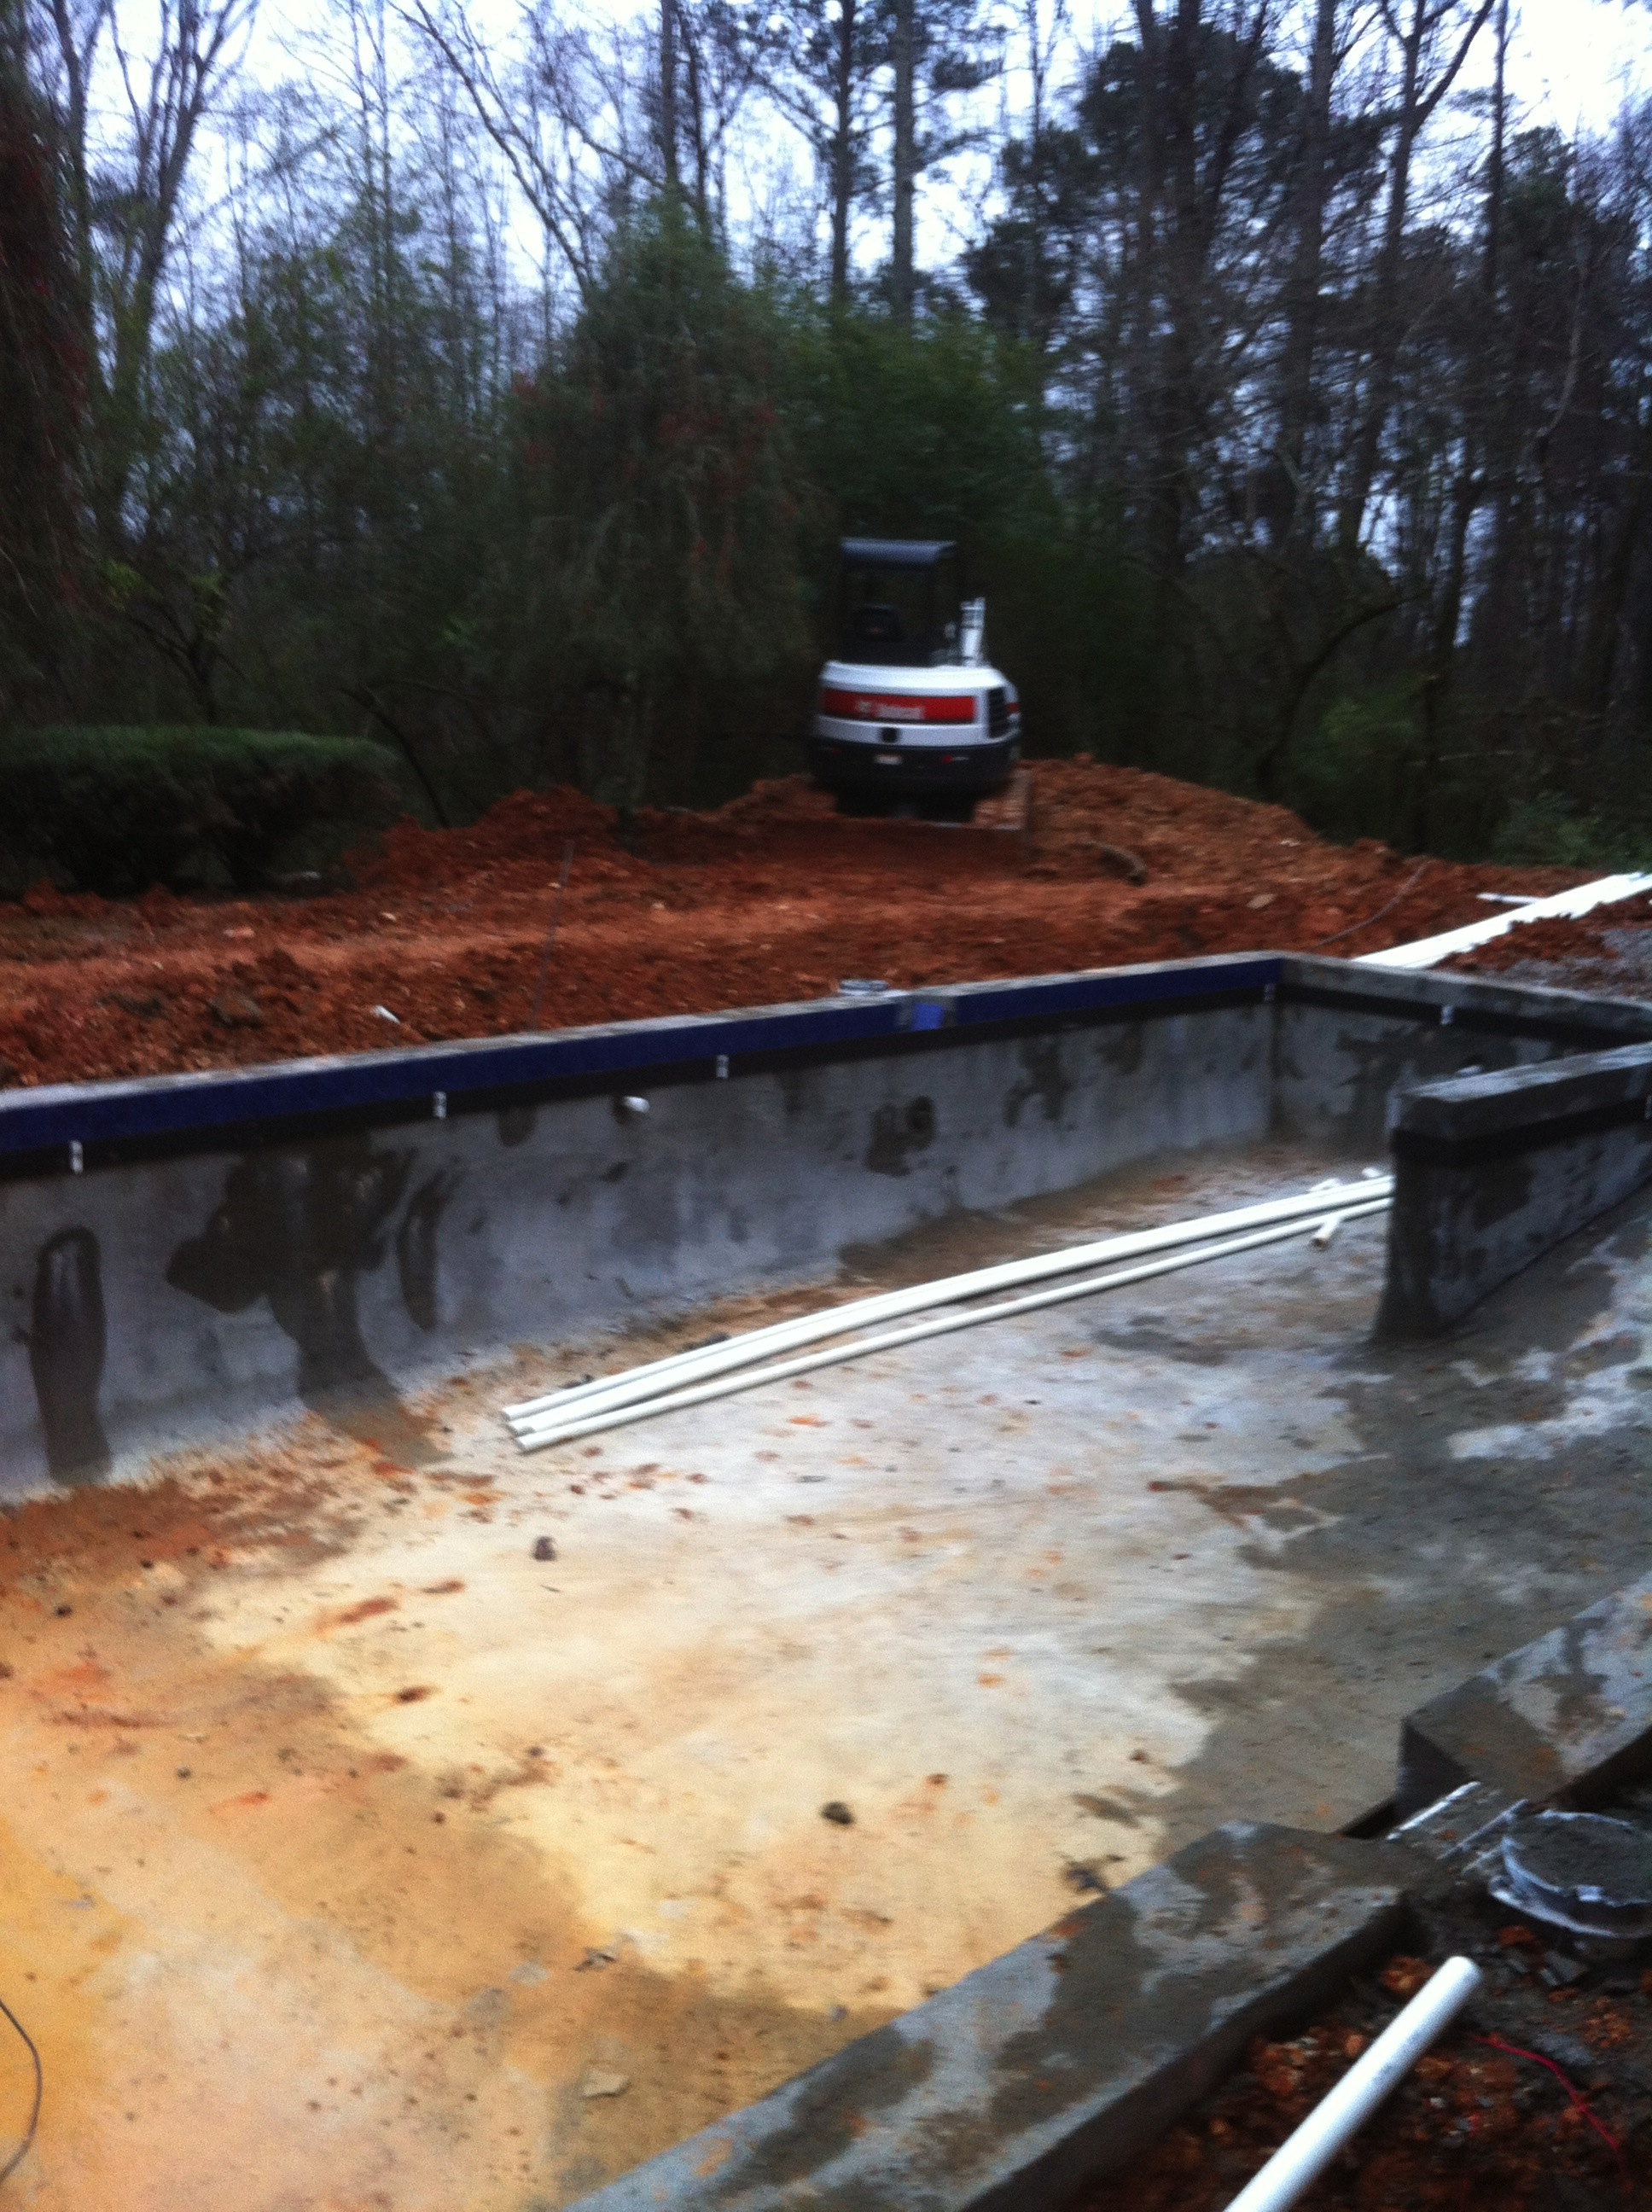 Inground swimming pool construction update swimming pool for In ground pool contractors